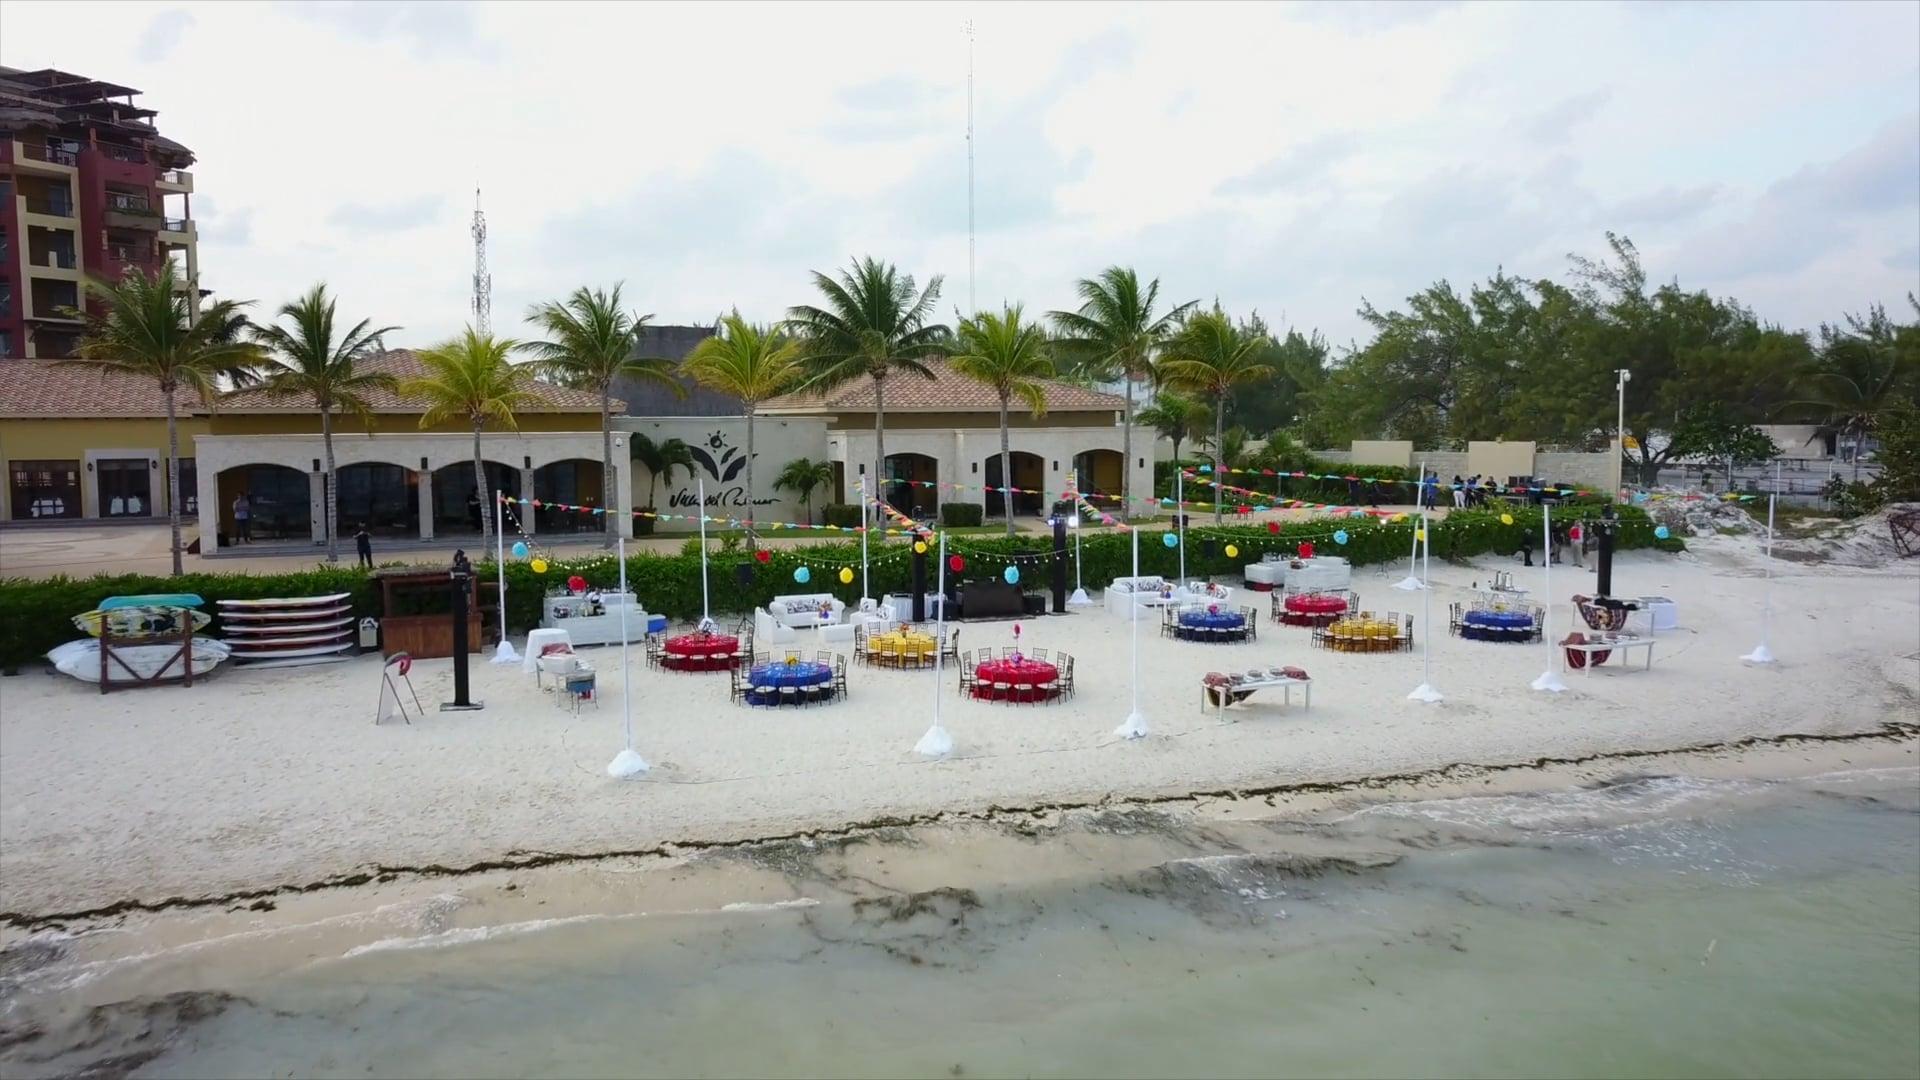 Villa del Palmar - Cancun, Mexico